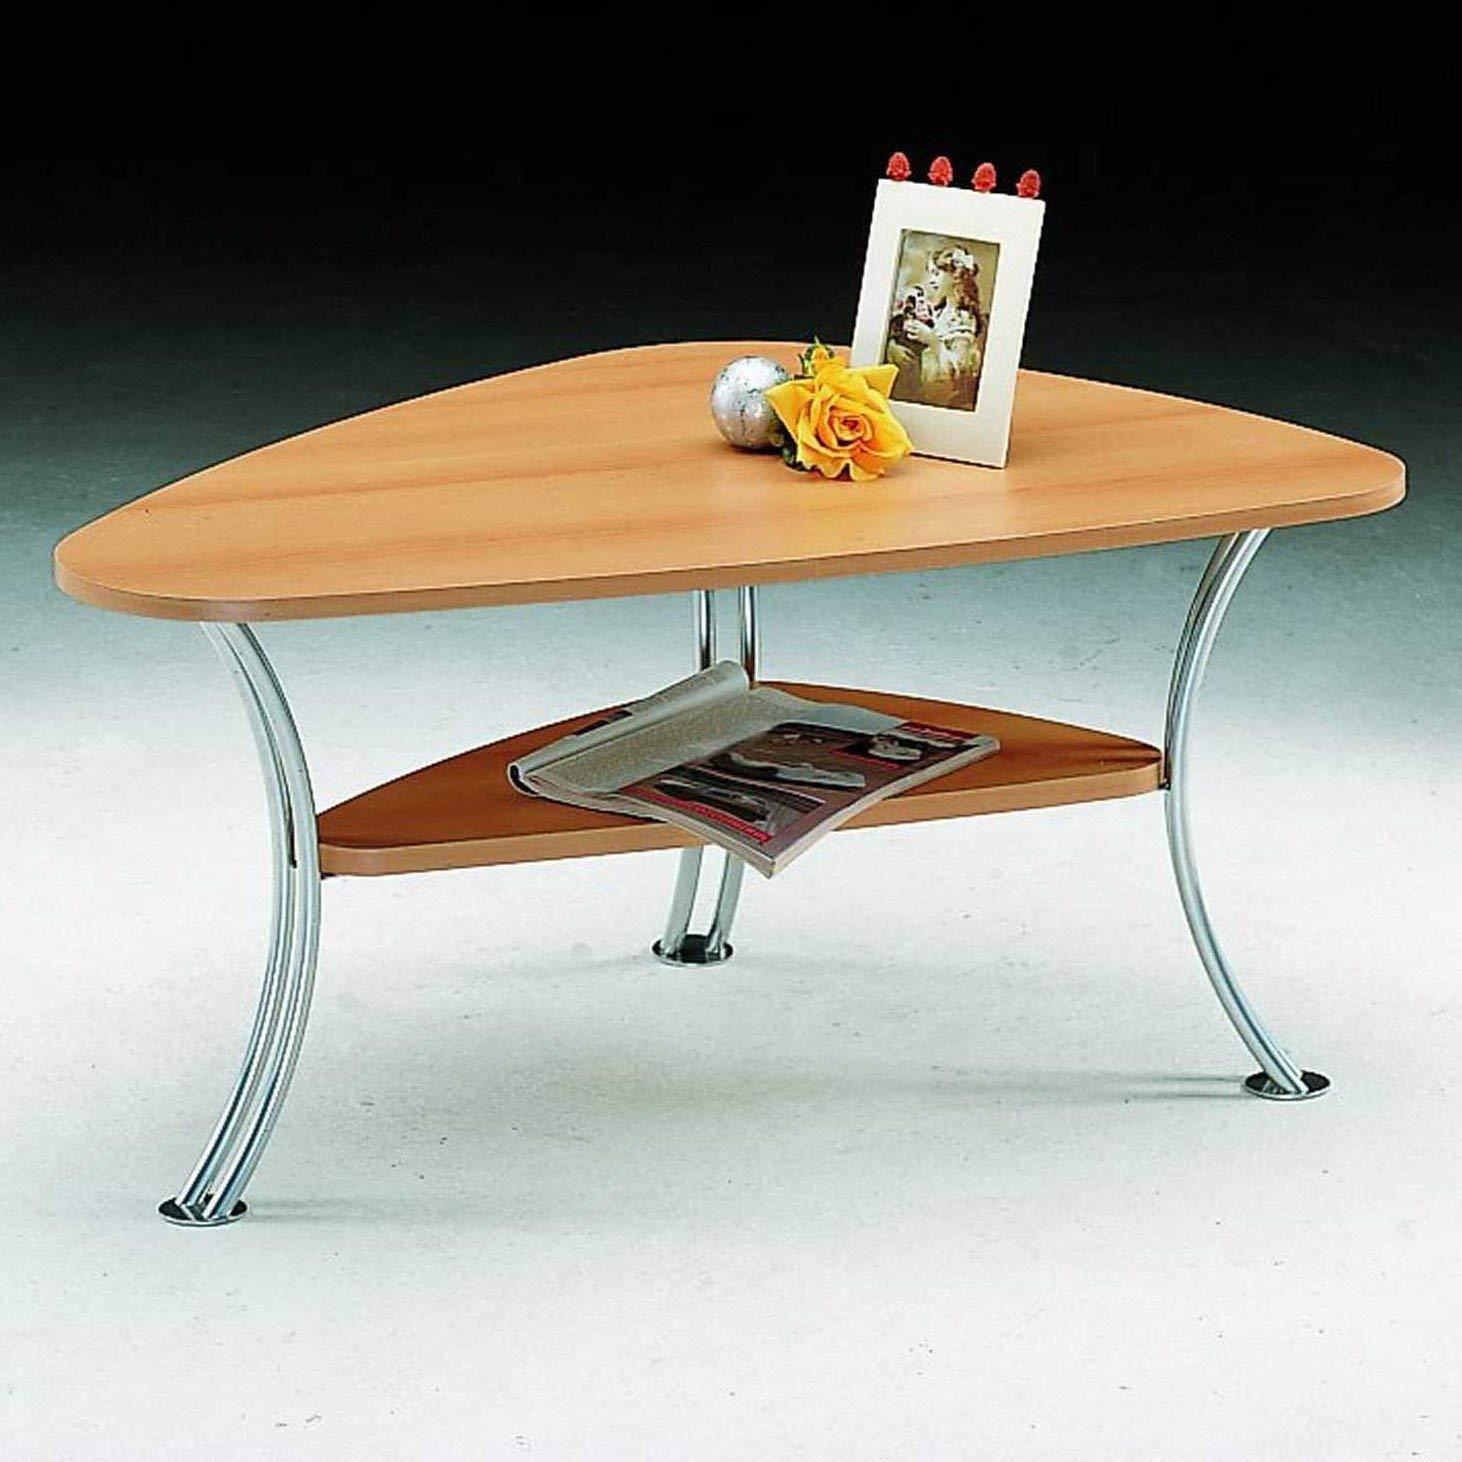 Alfa-Tische Table Basse Argent Naturel